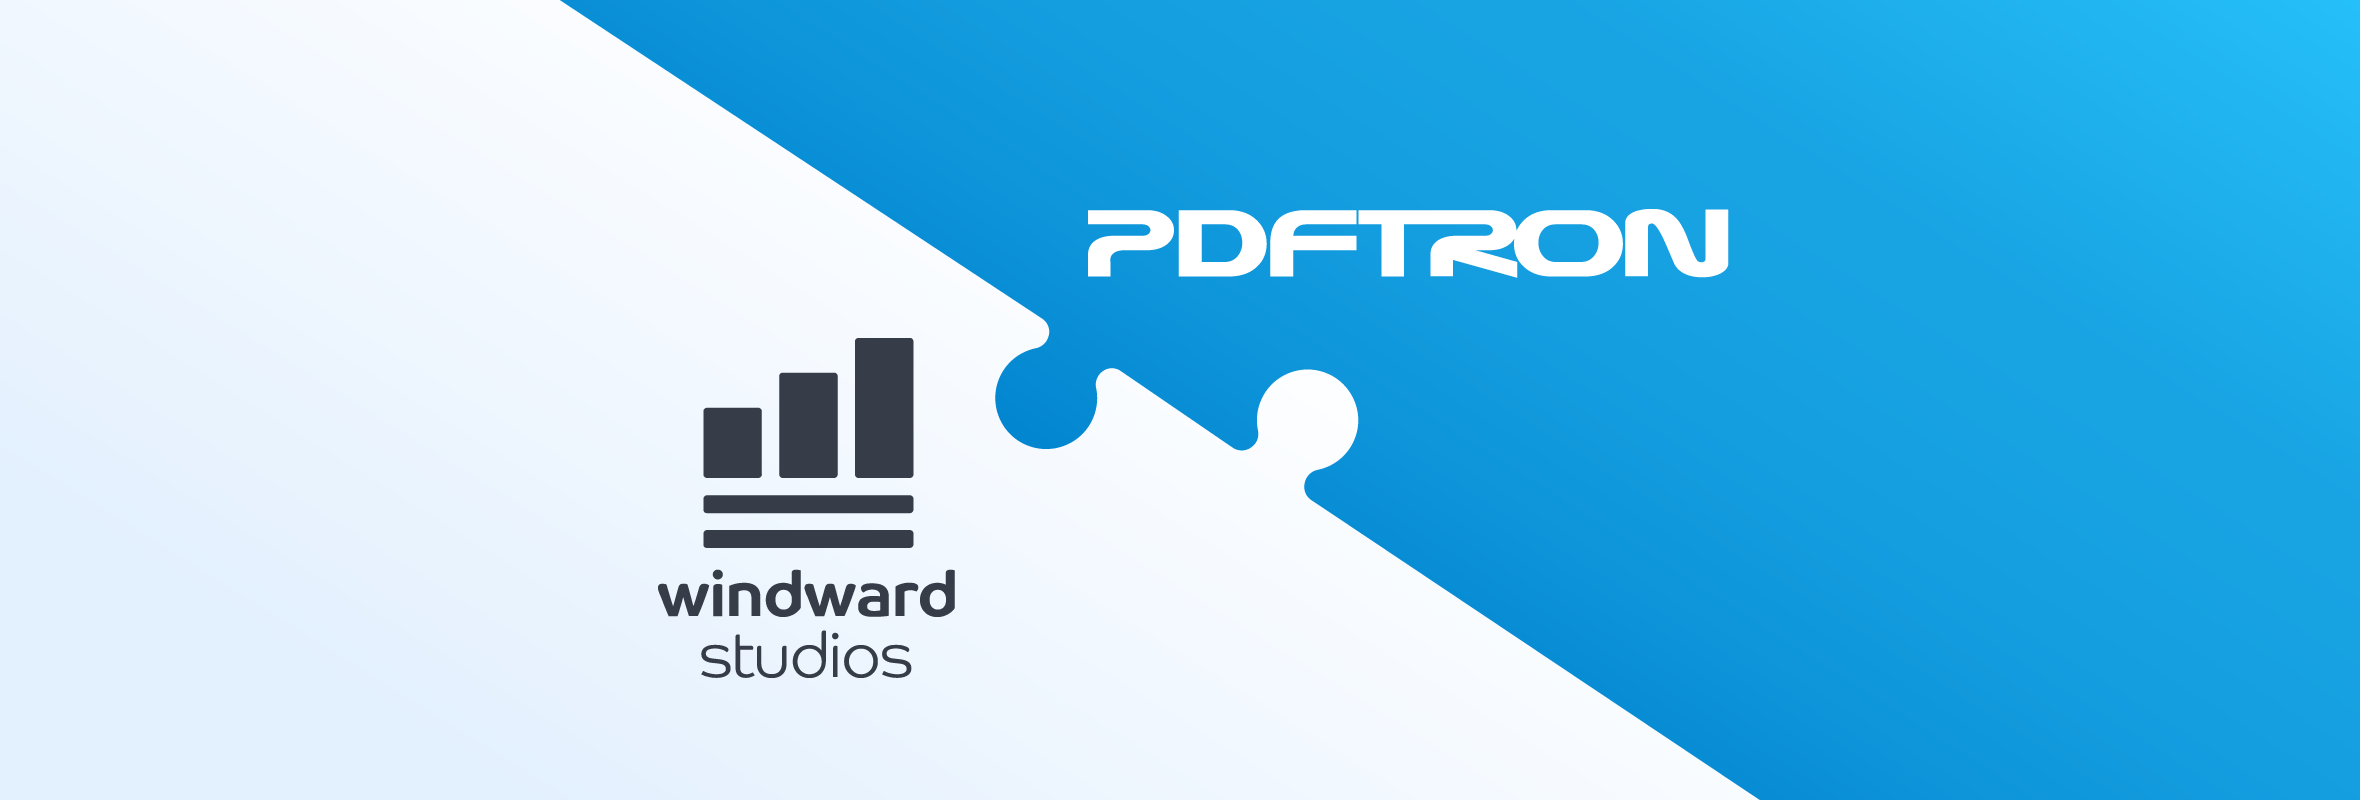 PDFTron Acquires Document Automation Leader Windward Studios